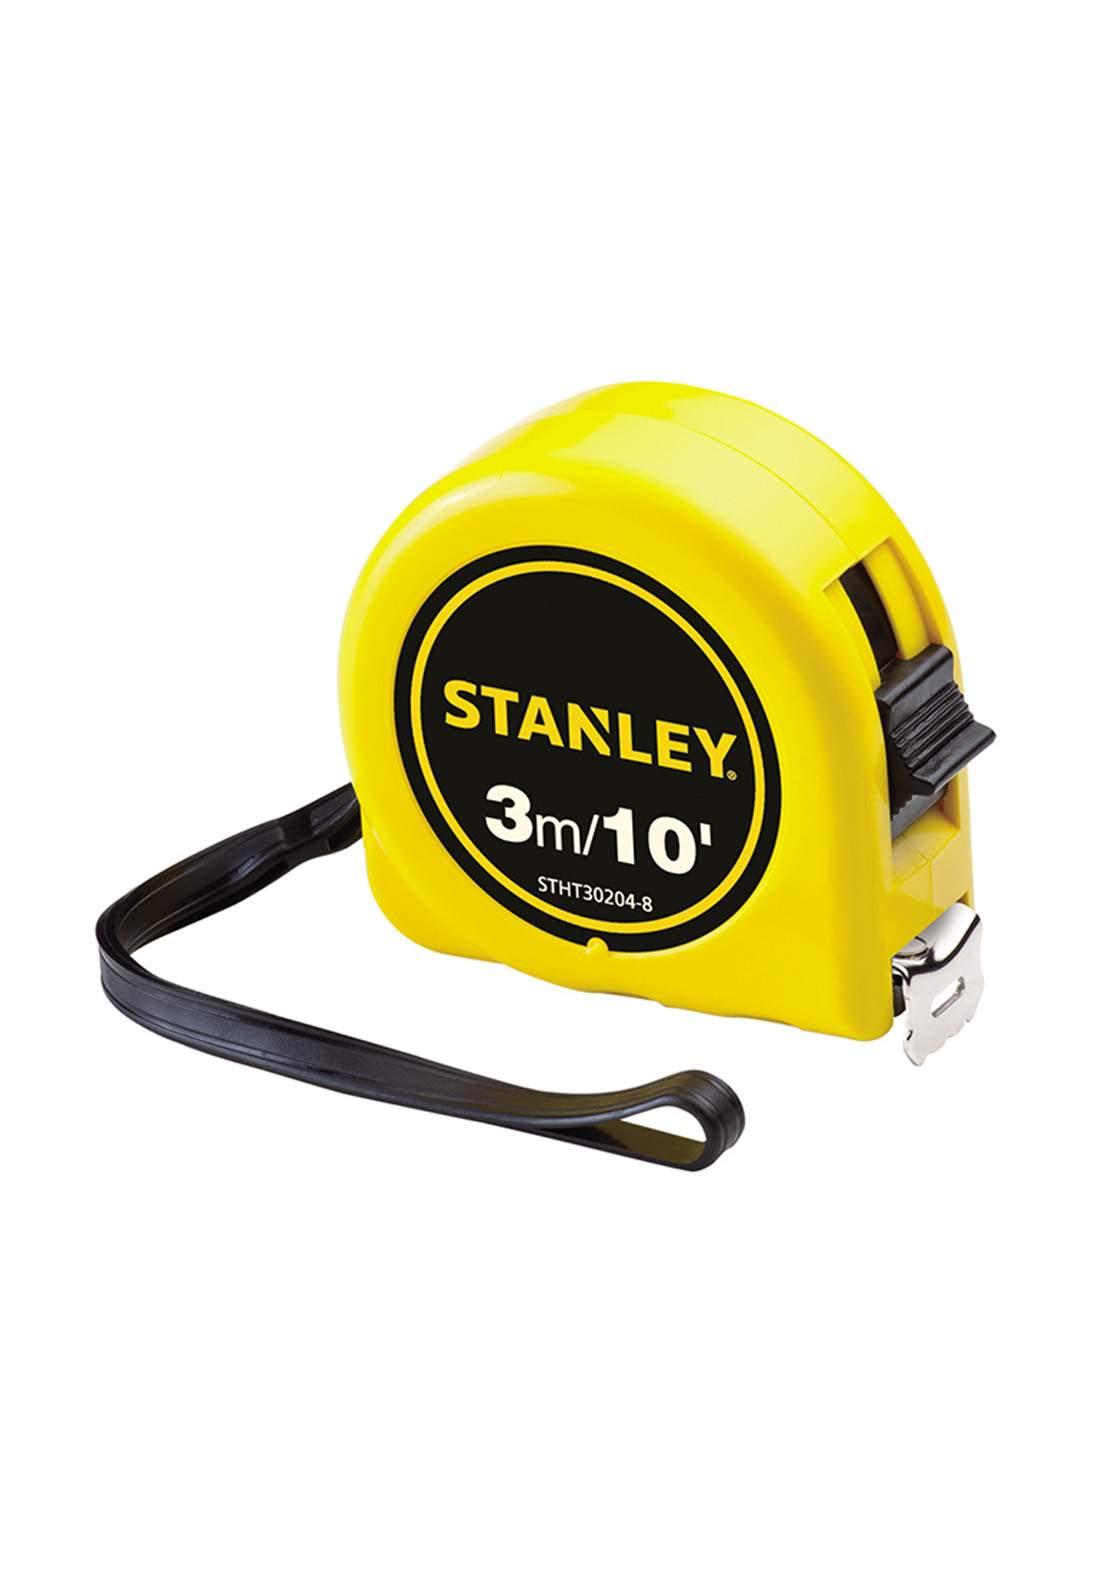 Stanley STHT30204-8 Measuring Tape 3m شريط قياس